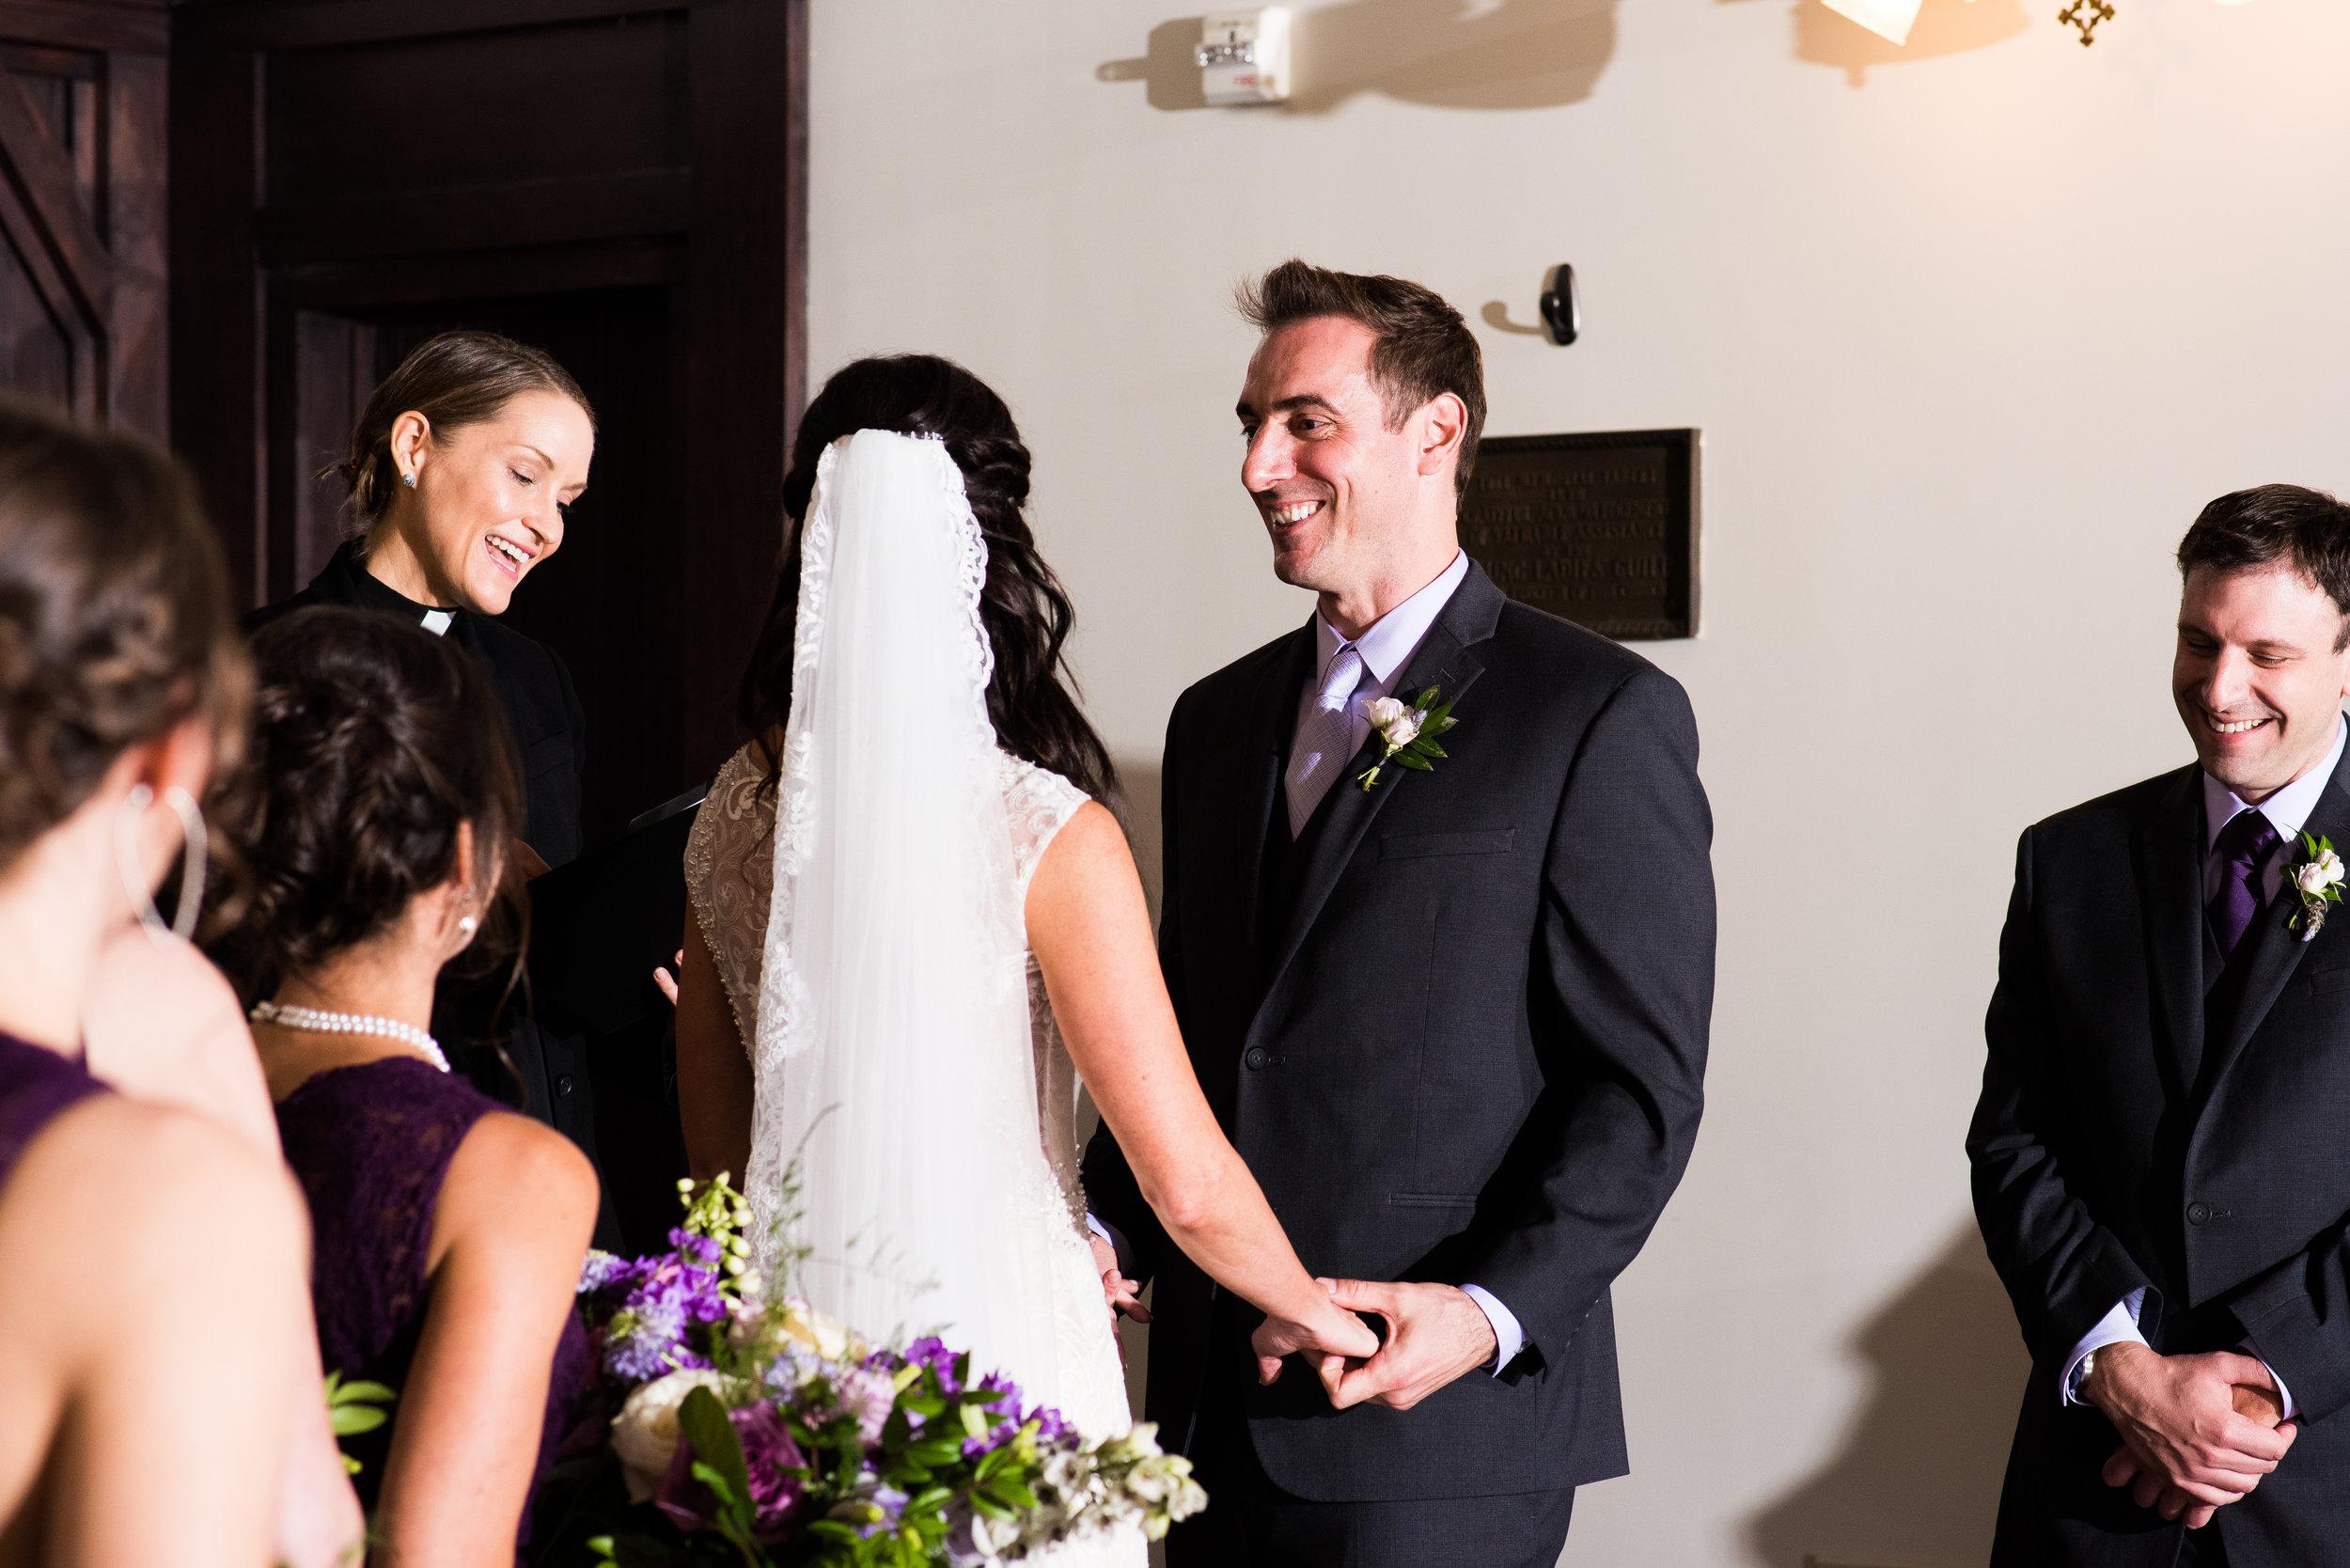 Heather & Lincoln Groves Wedding SP WEB_63.jpg